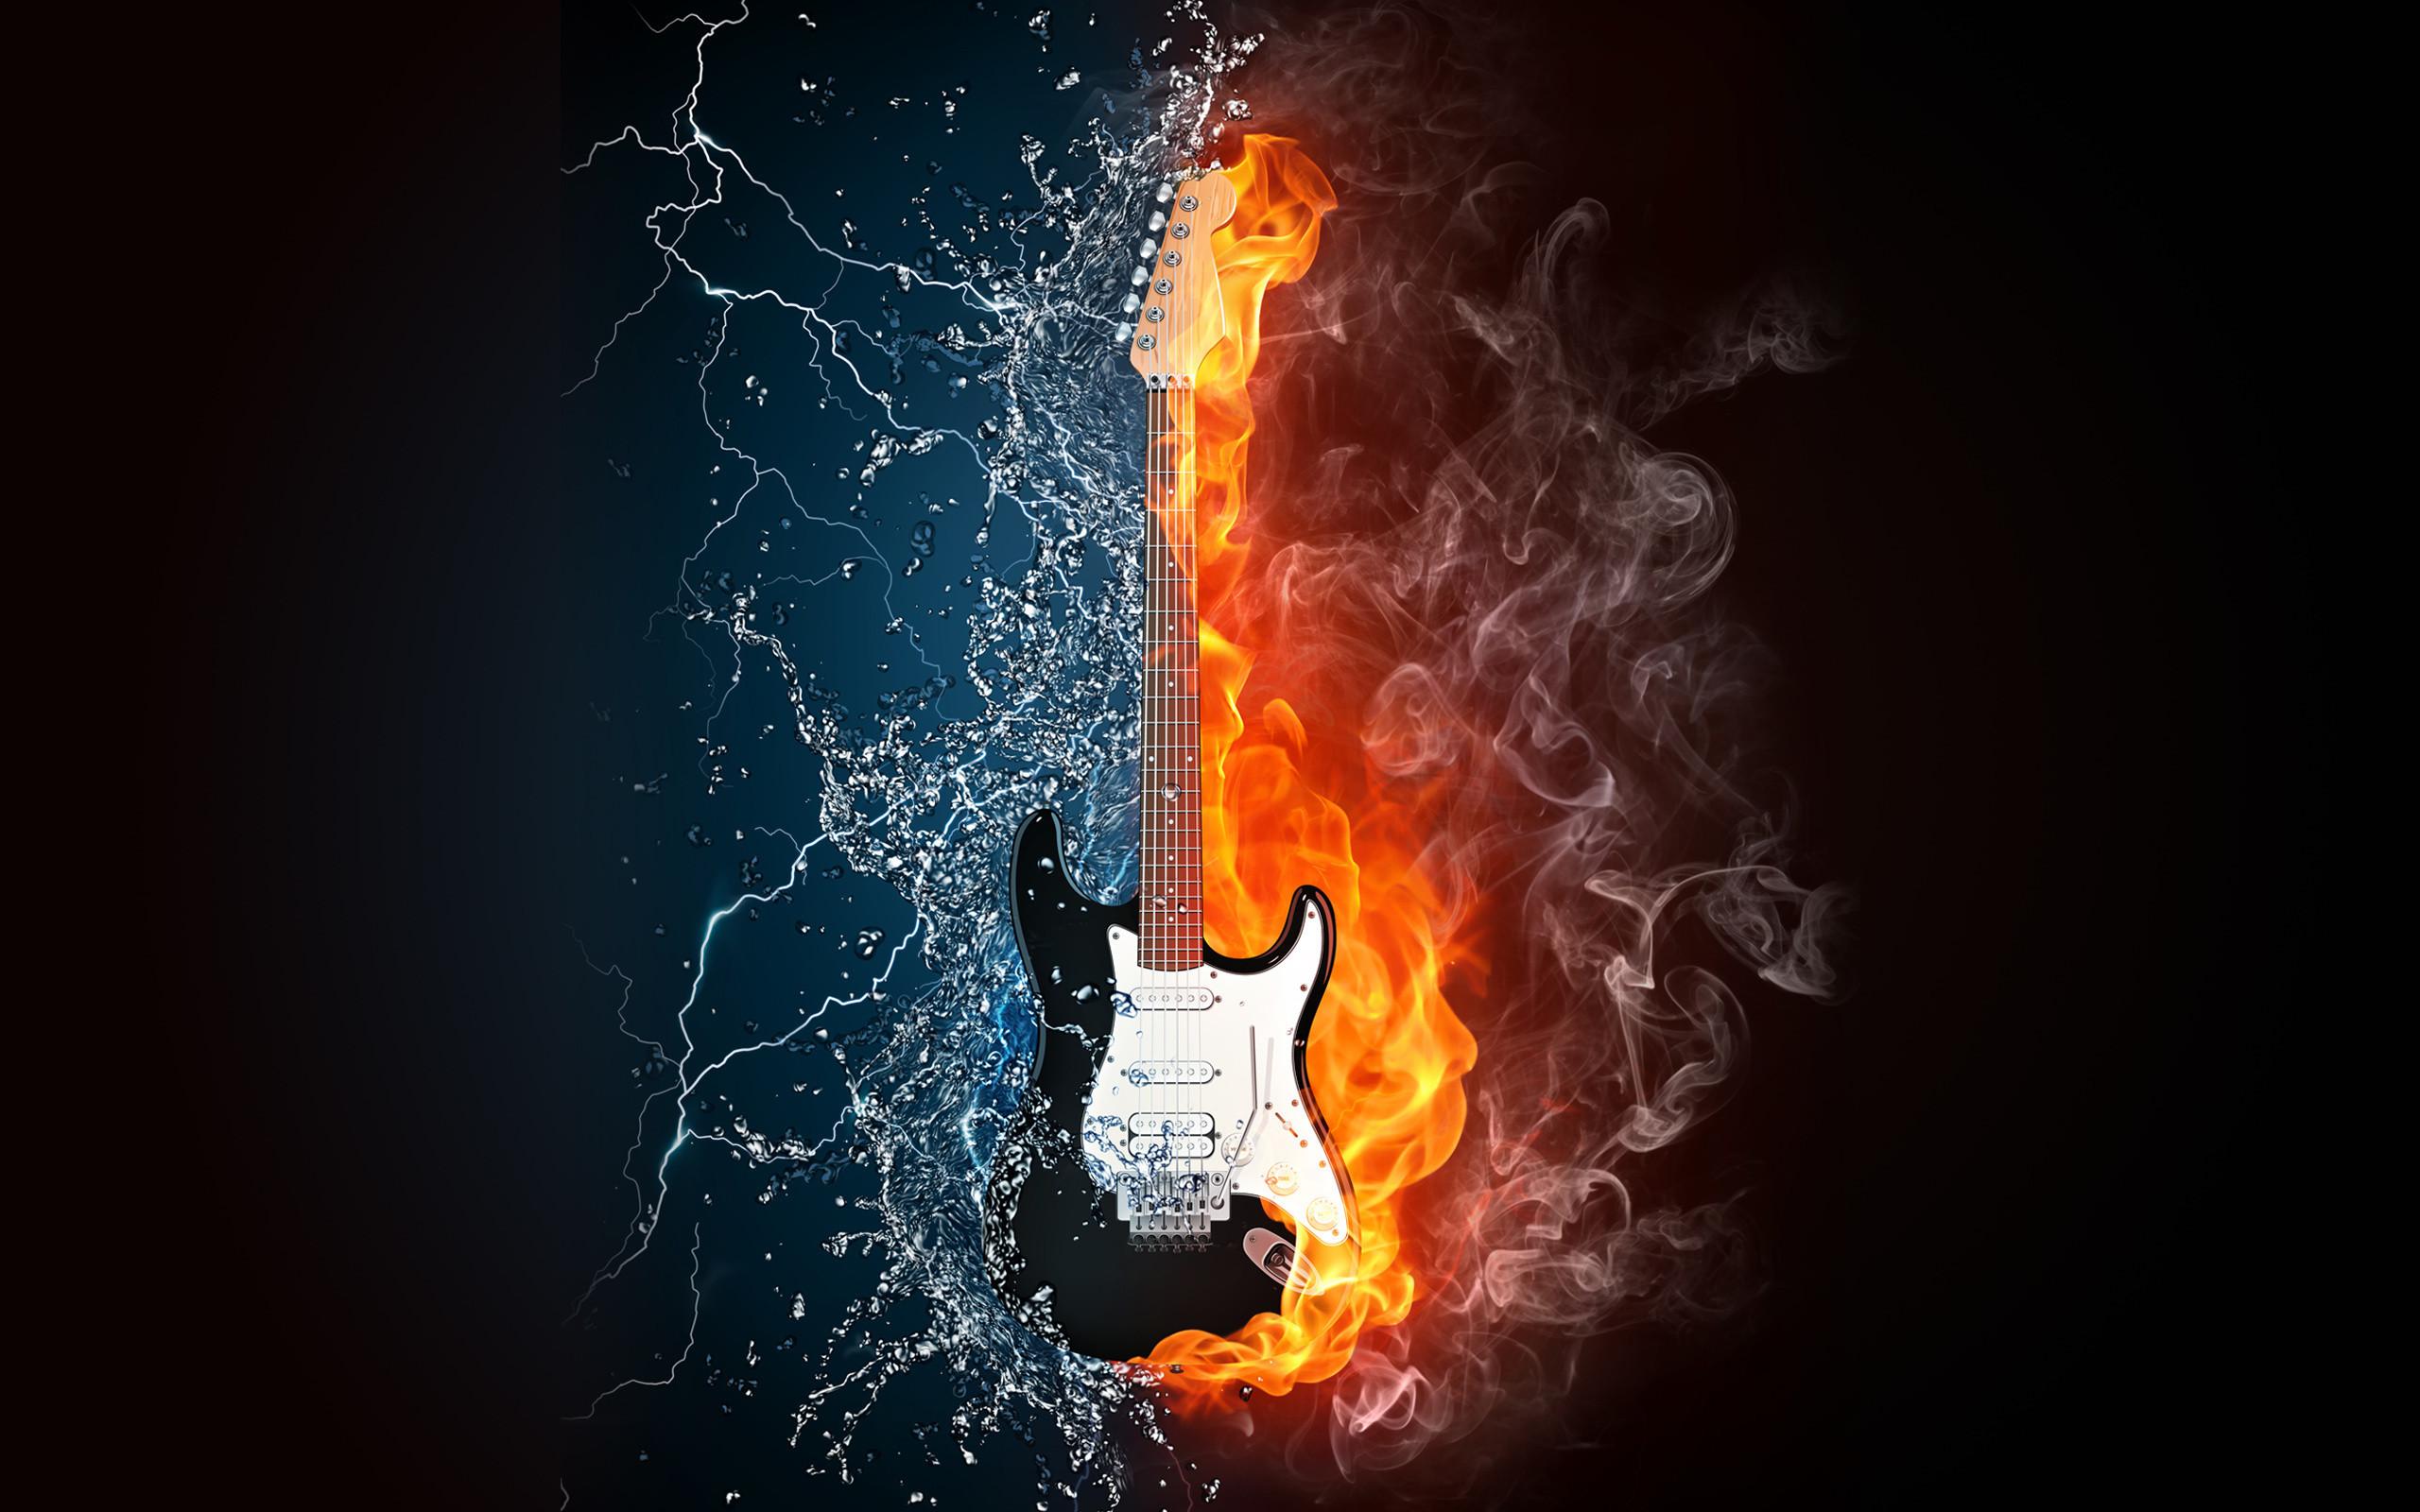 Photo Wallpaper Music Guitar Fender Gibson Blues Cool Guitar Backgrounds 1332x850 Wallpaper Teahub Io